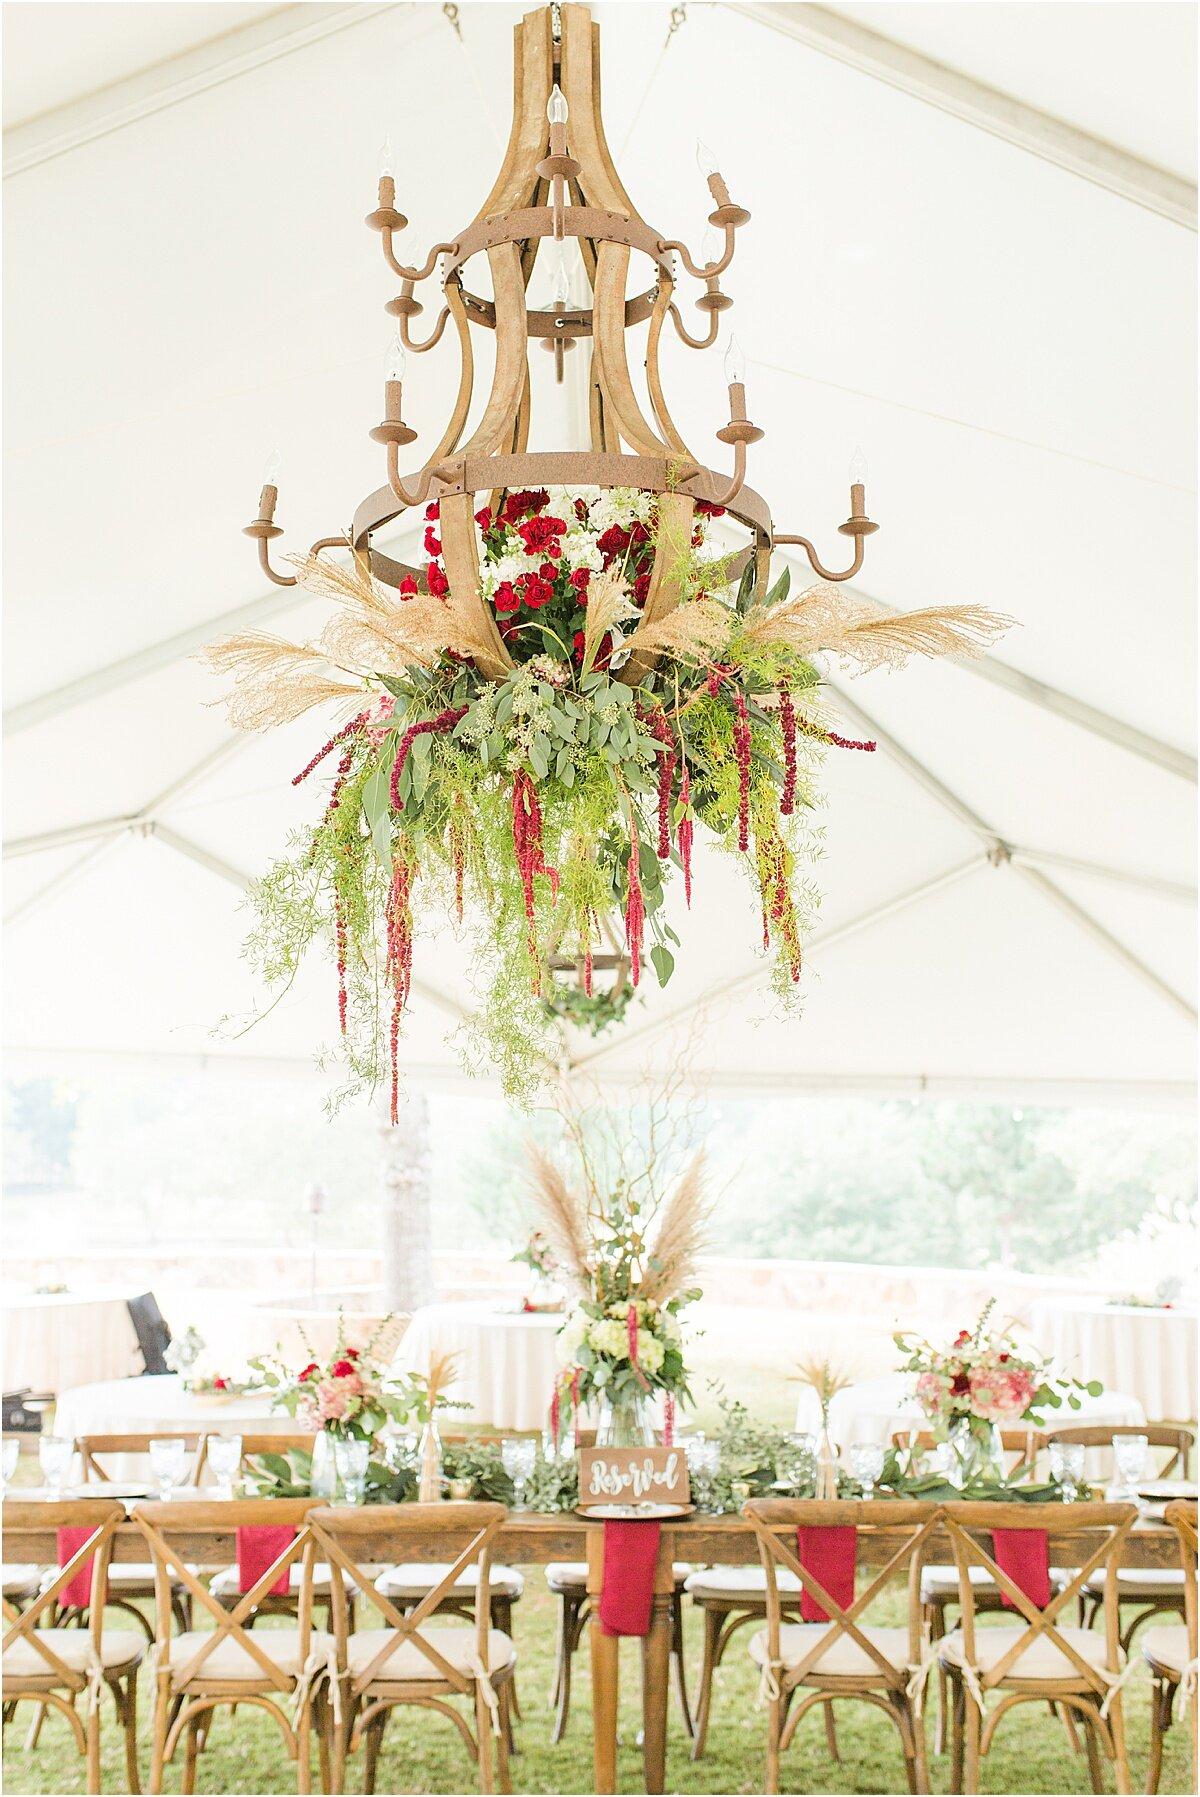 Jersey_Ga_Wedding_Venues_Holly_L_Robbins_Photography_0114.jpg